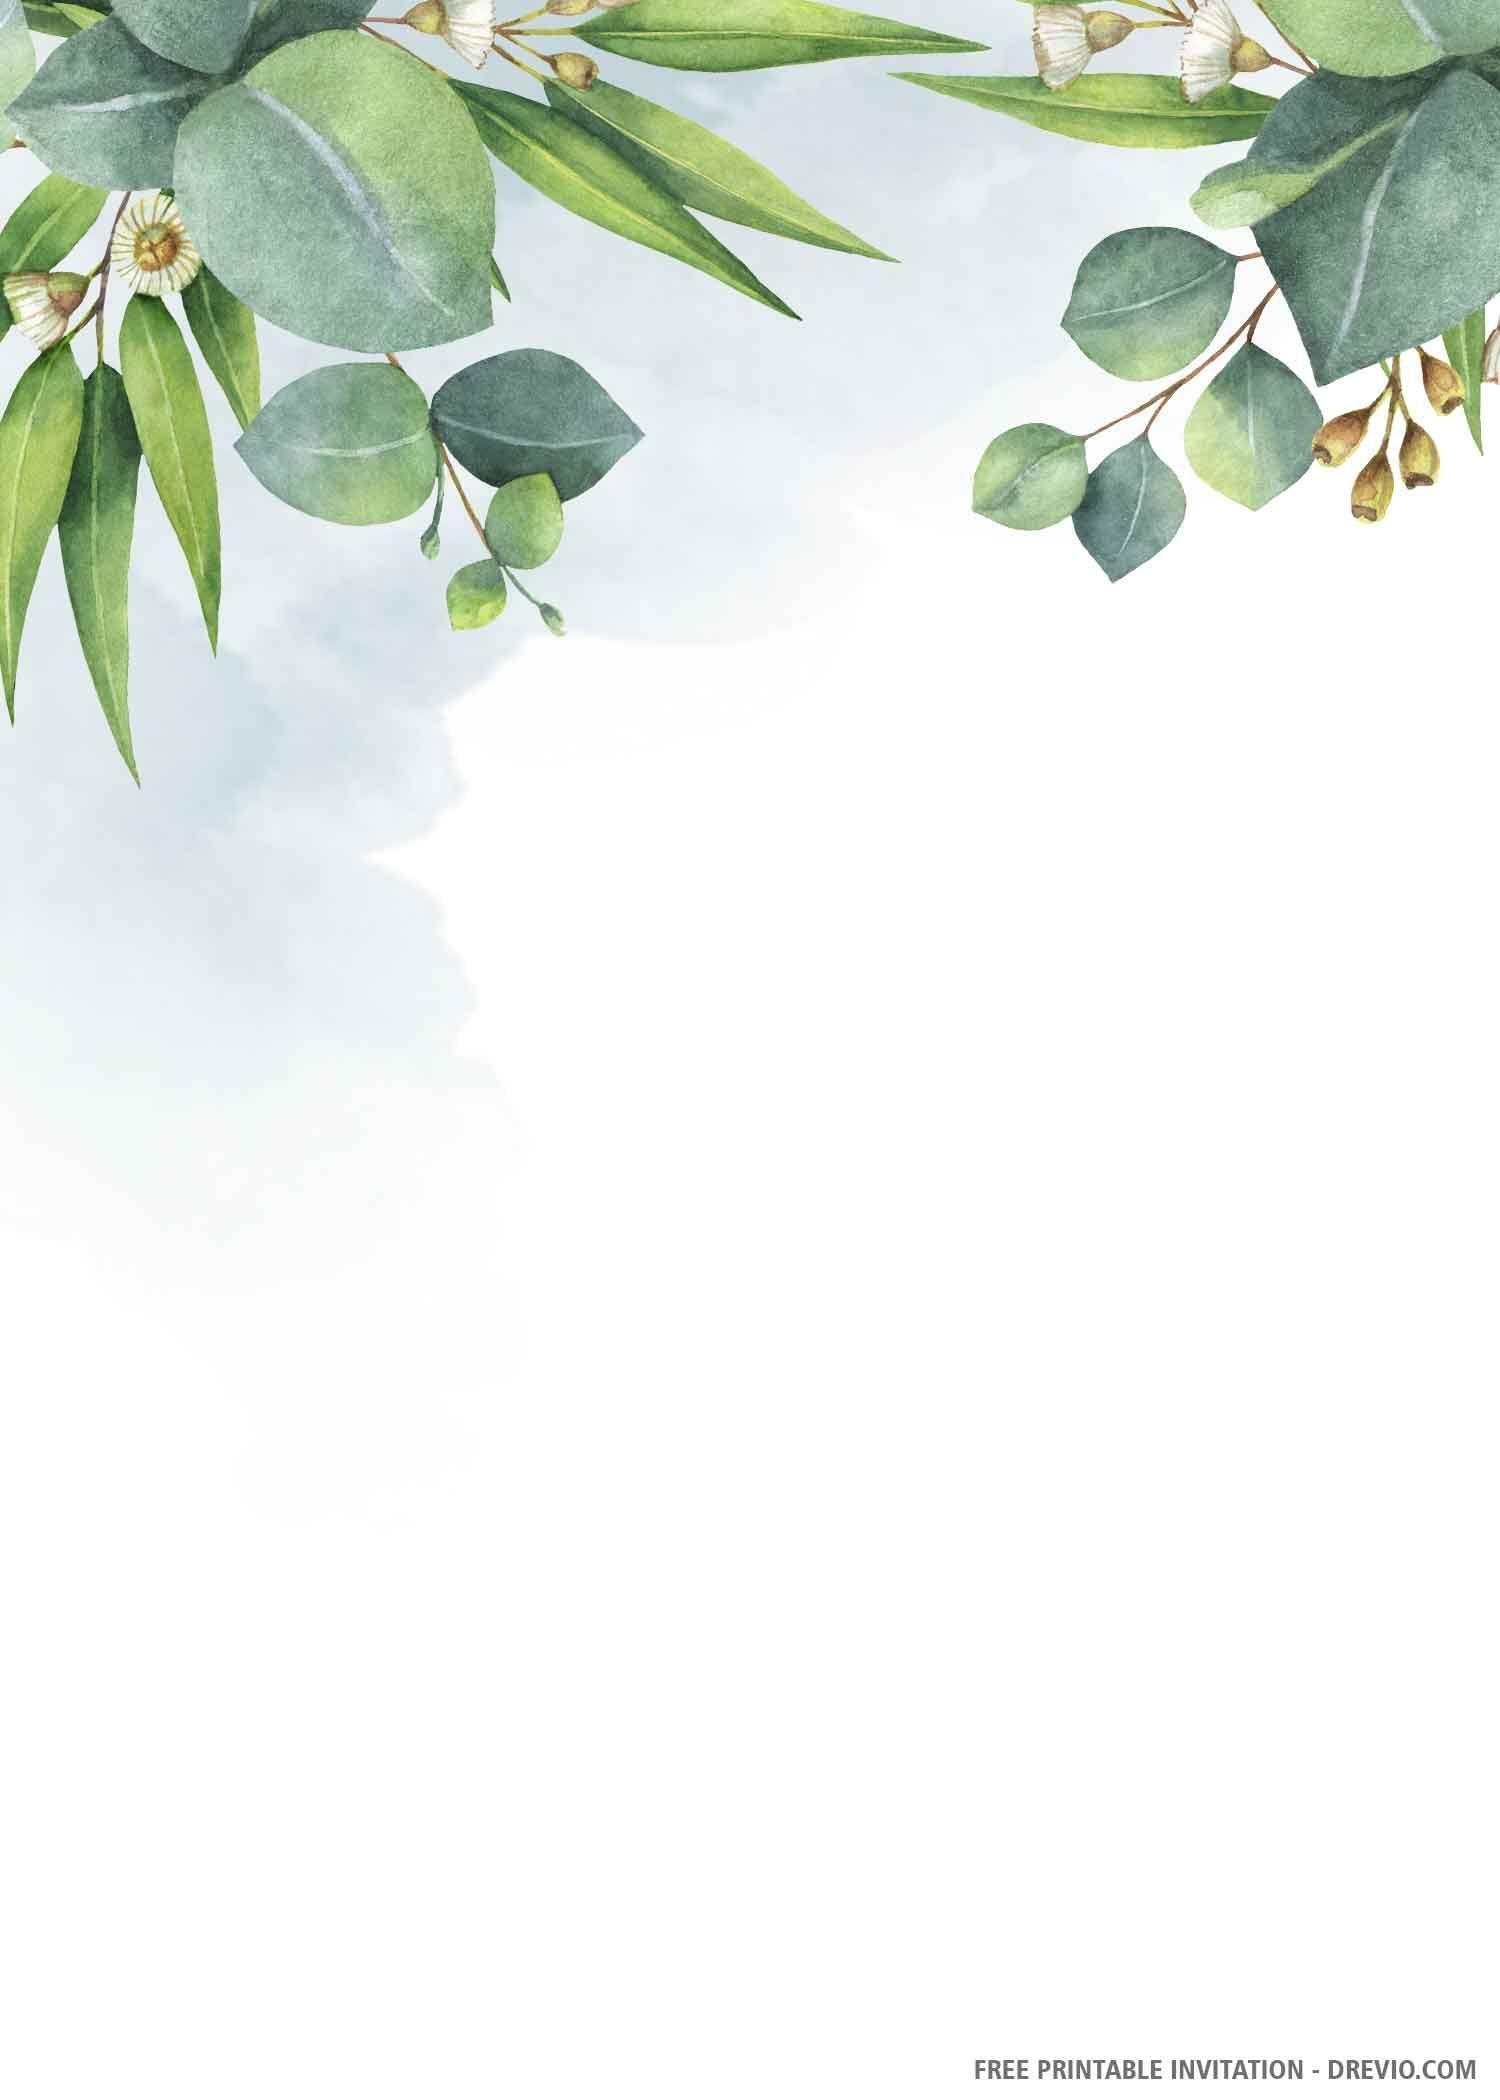 Free Printable Greenery Wedding Invitation Templates Drevio In 2020 Greenery Wedding Invitations Wedding Invitation Templates Free Printable Wedding Invitation Templates